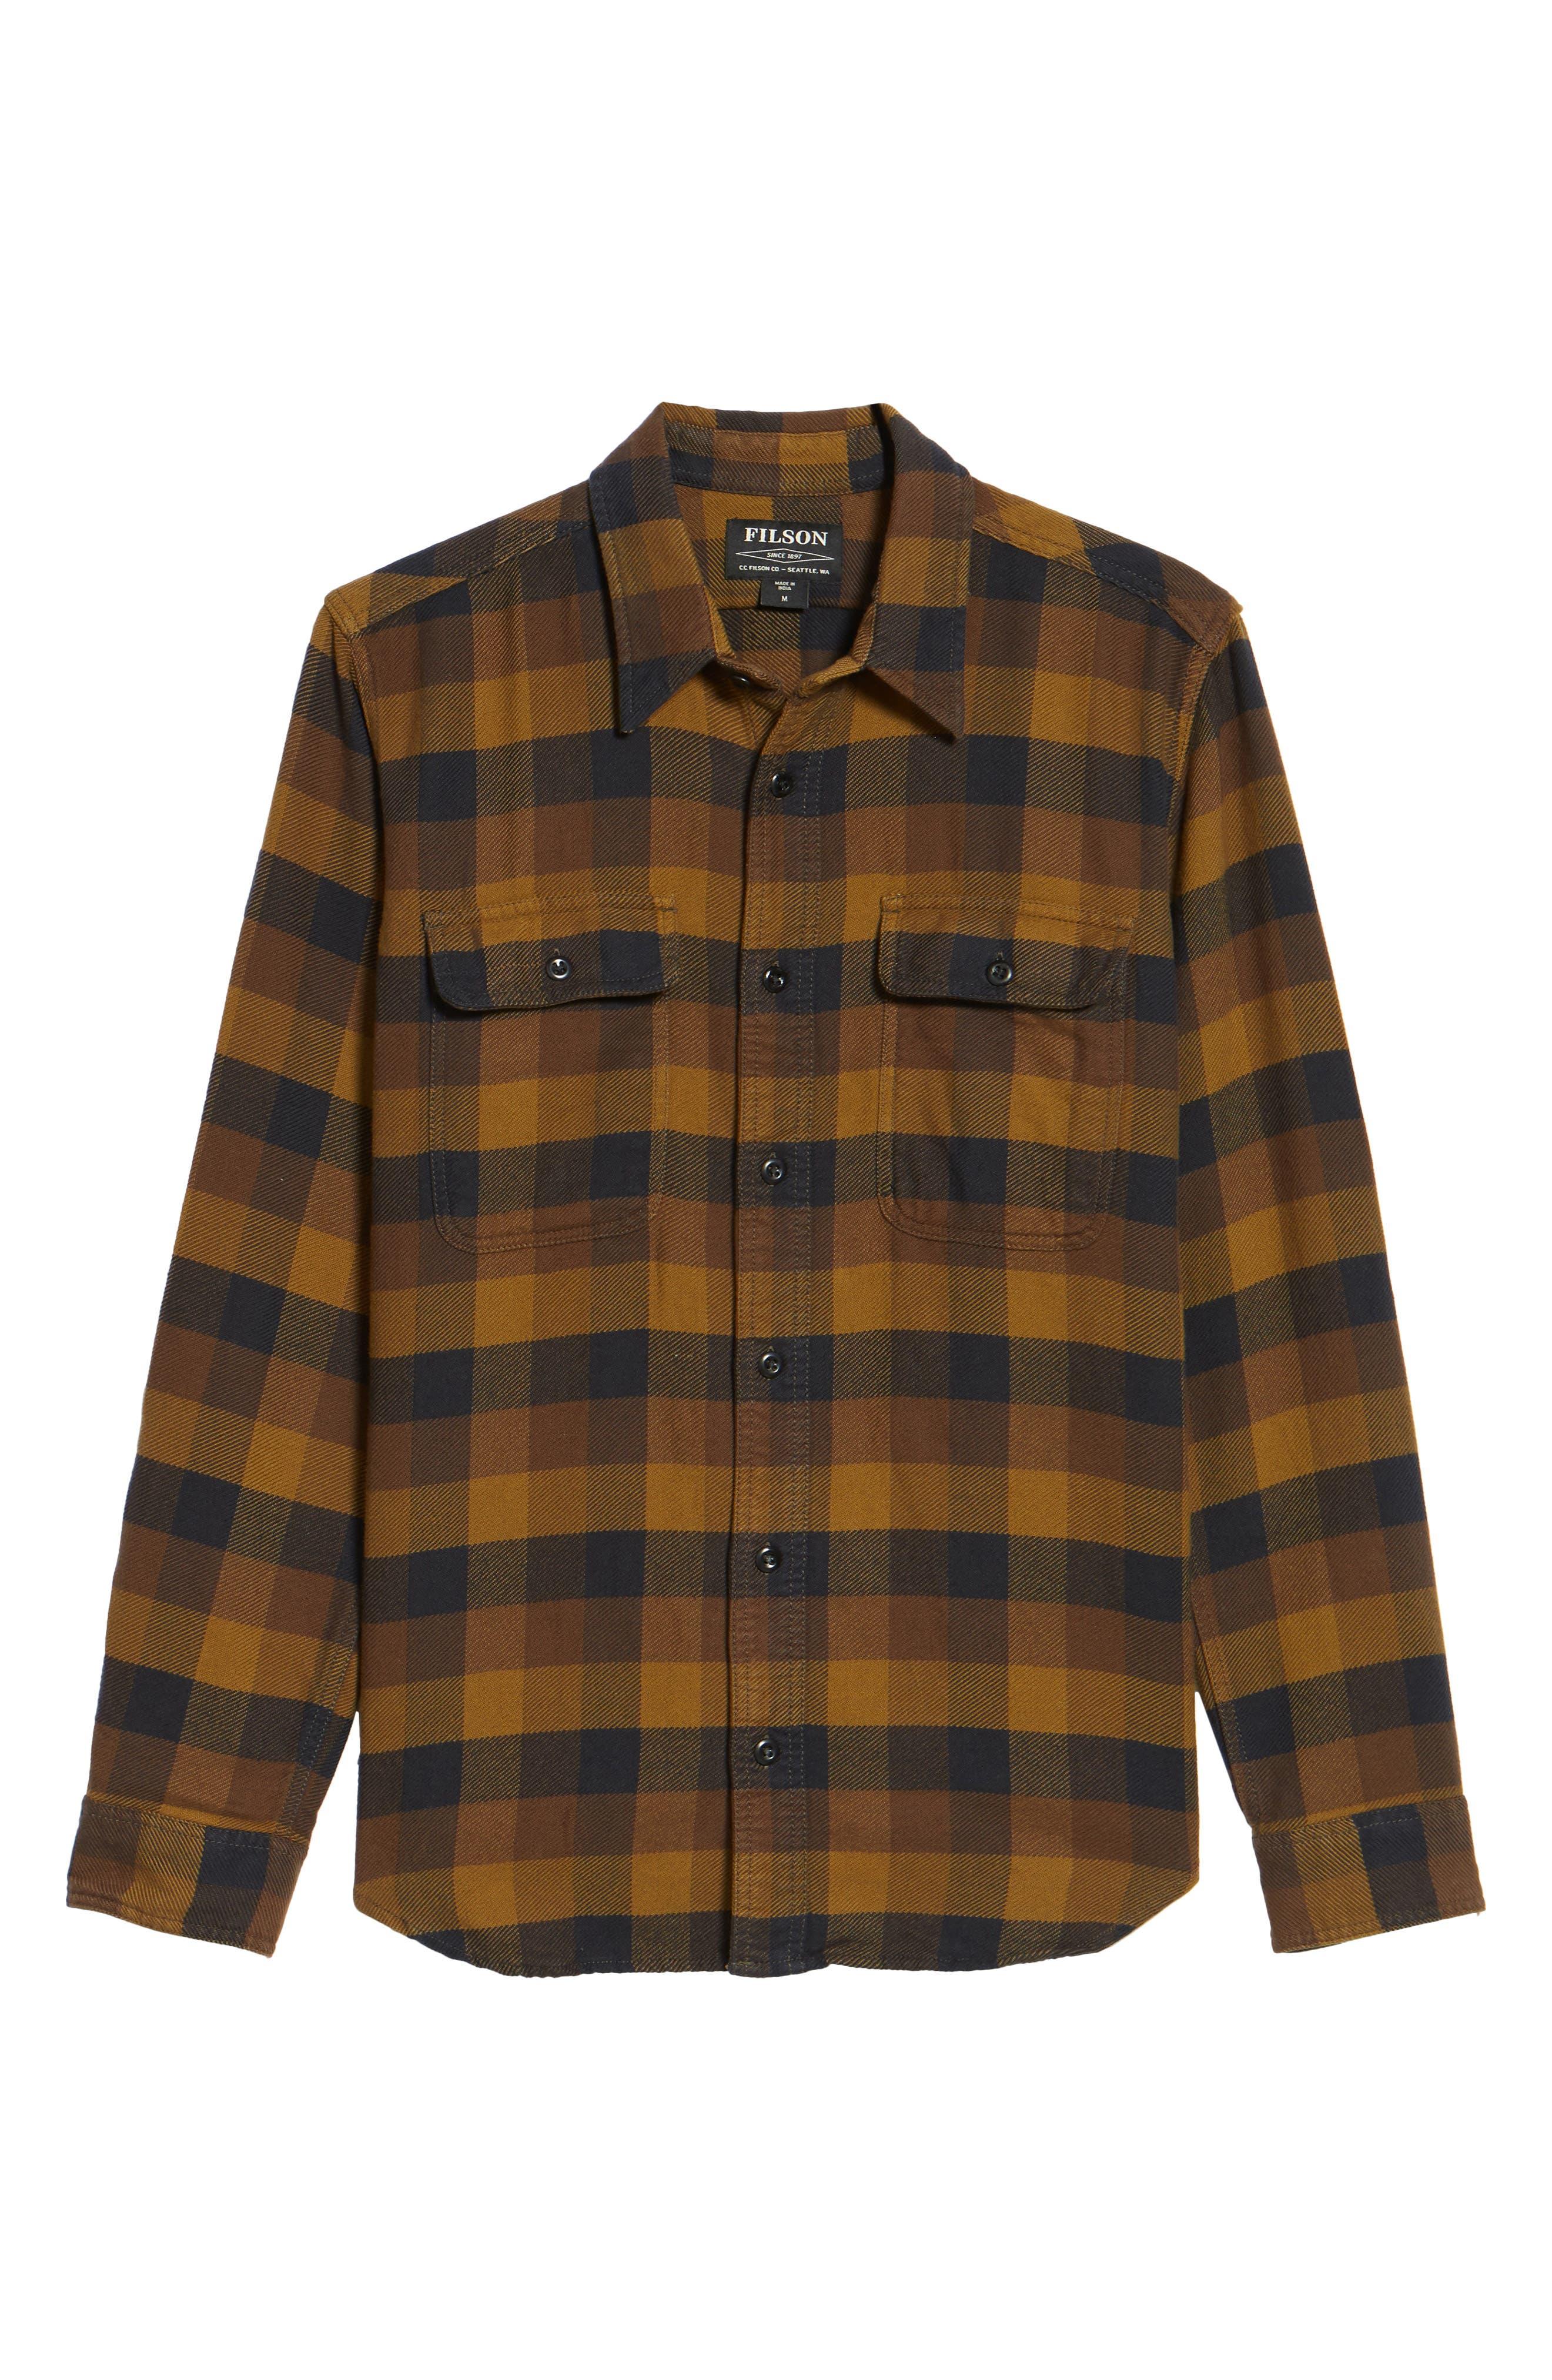 'Vintage Flannel' Regular Fit Plaid Cotton Shirt,                             Alternate thumbnail 6, color,                             Brown/ Navy